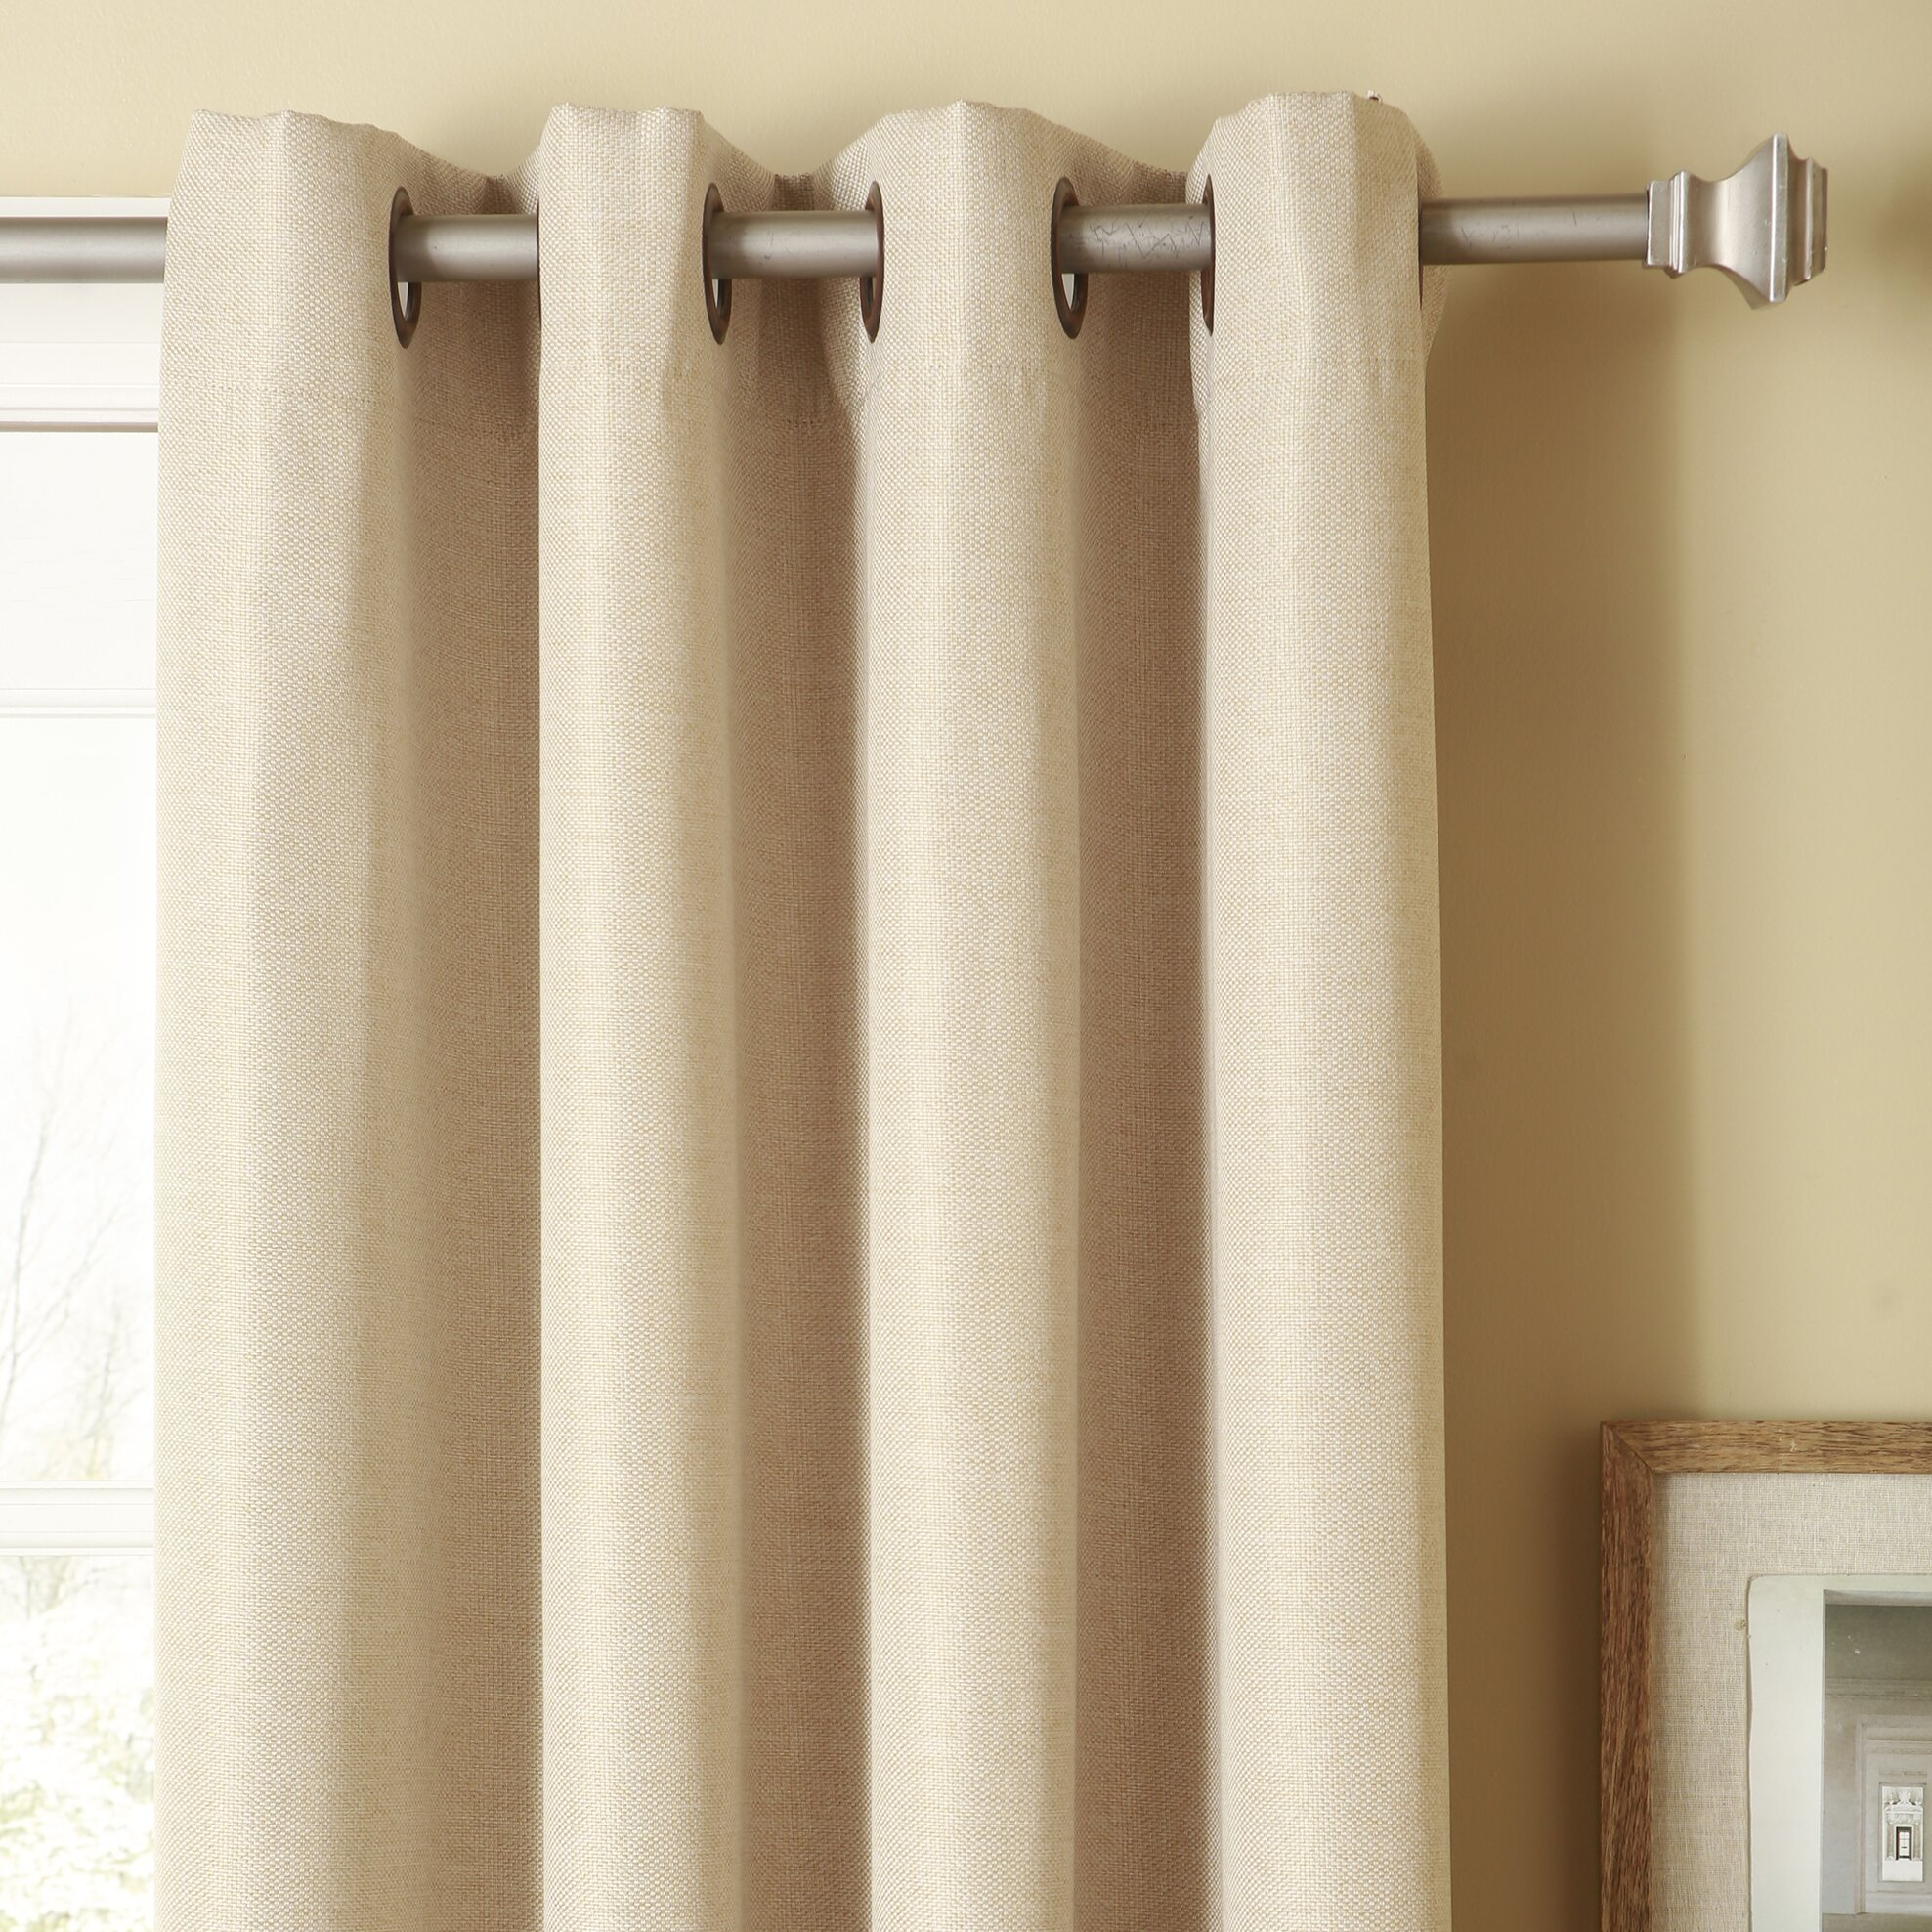 Best Home Fashion Inc Basketweave Room Darkening Curtain Panels Reviews Wayfair